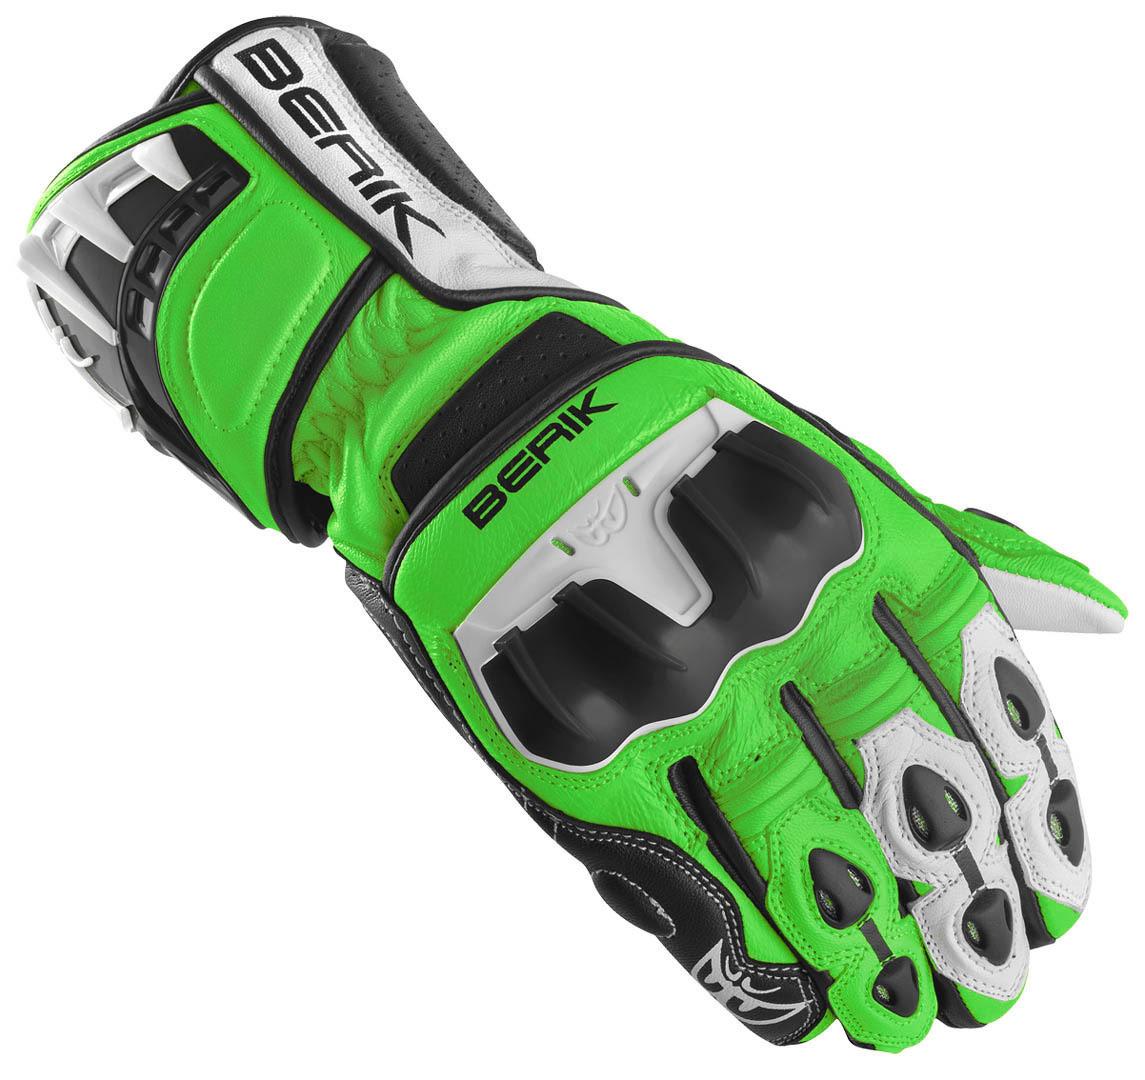 Berik Track Plus Motorradhandschuhe, schwarz-weiss-grün, Größe XL, schwarz-weiss-grün, Größe XL